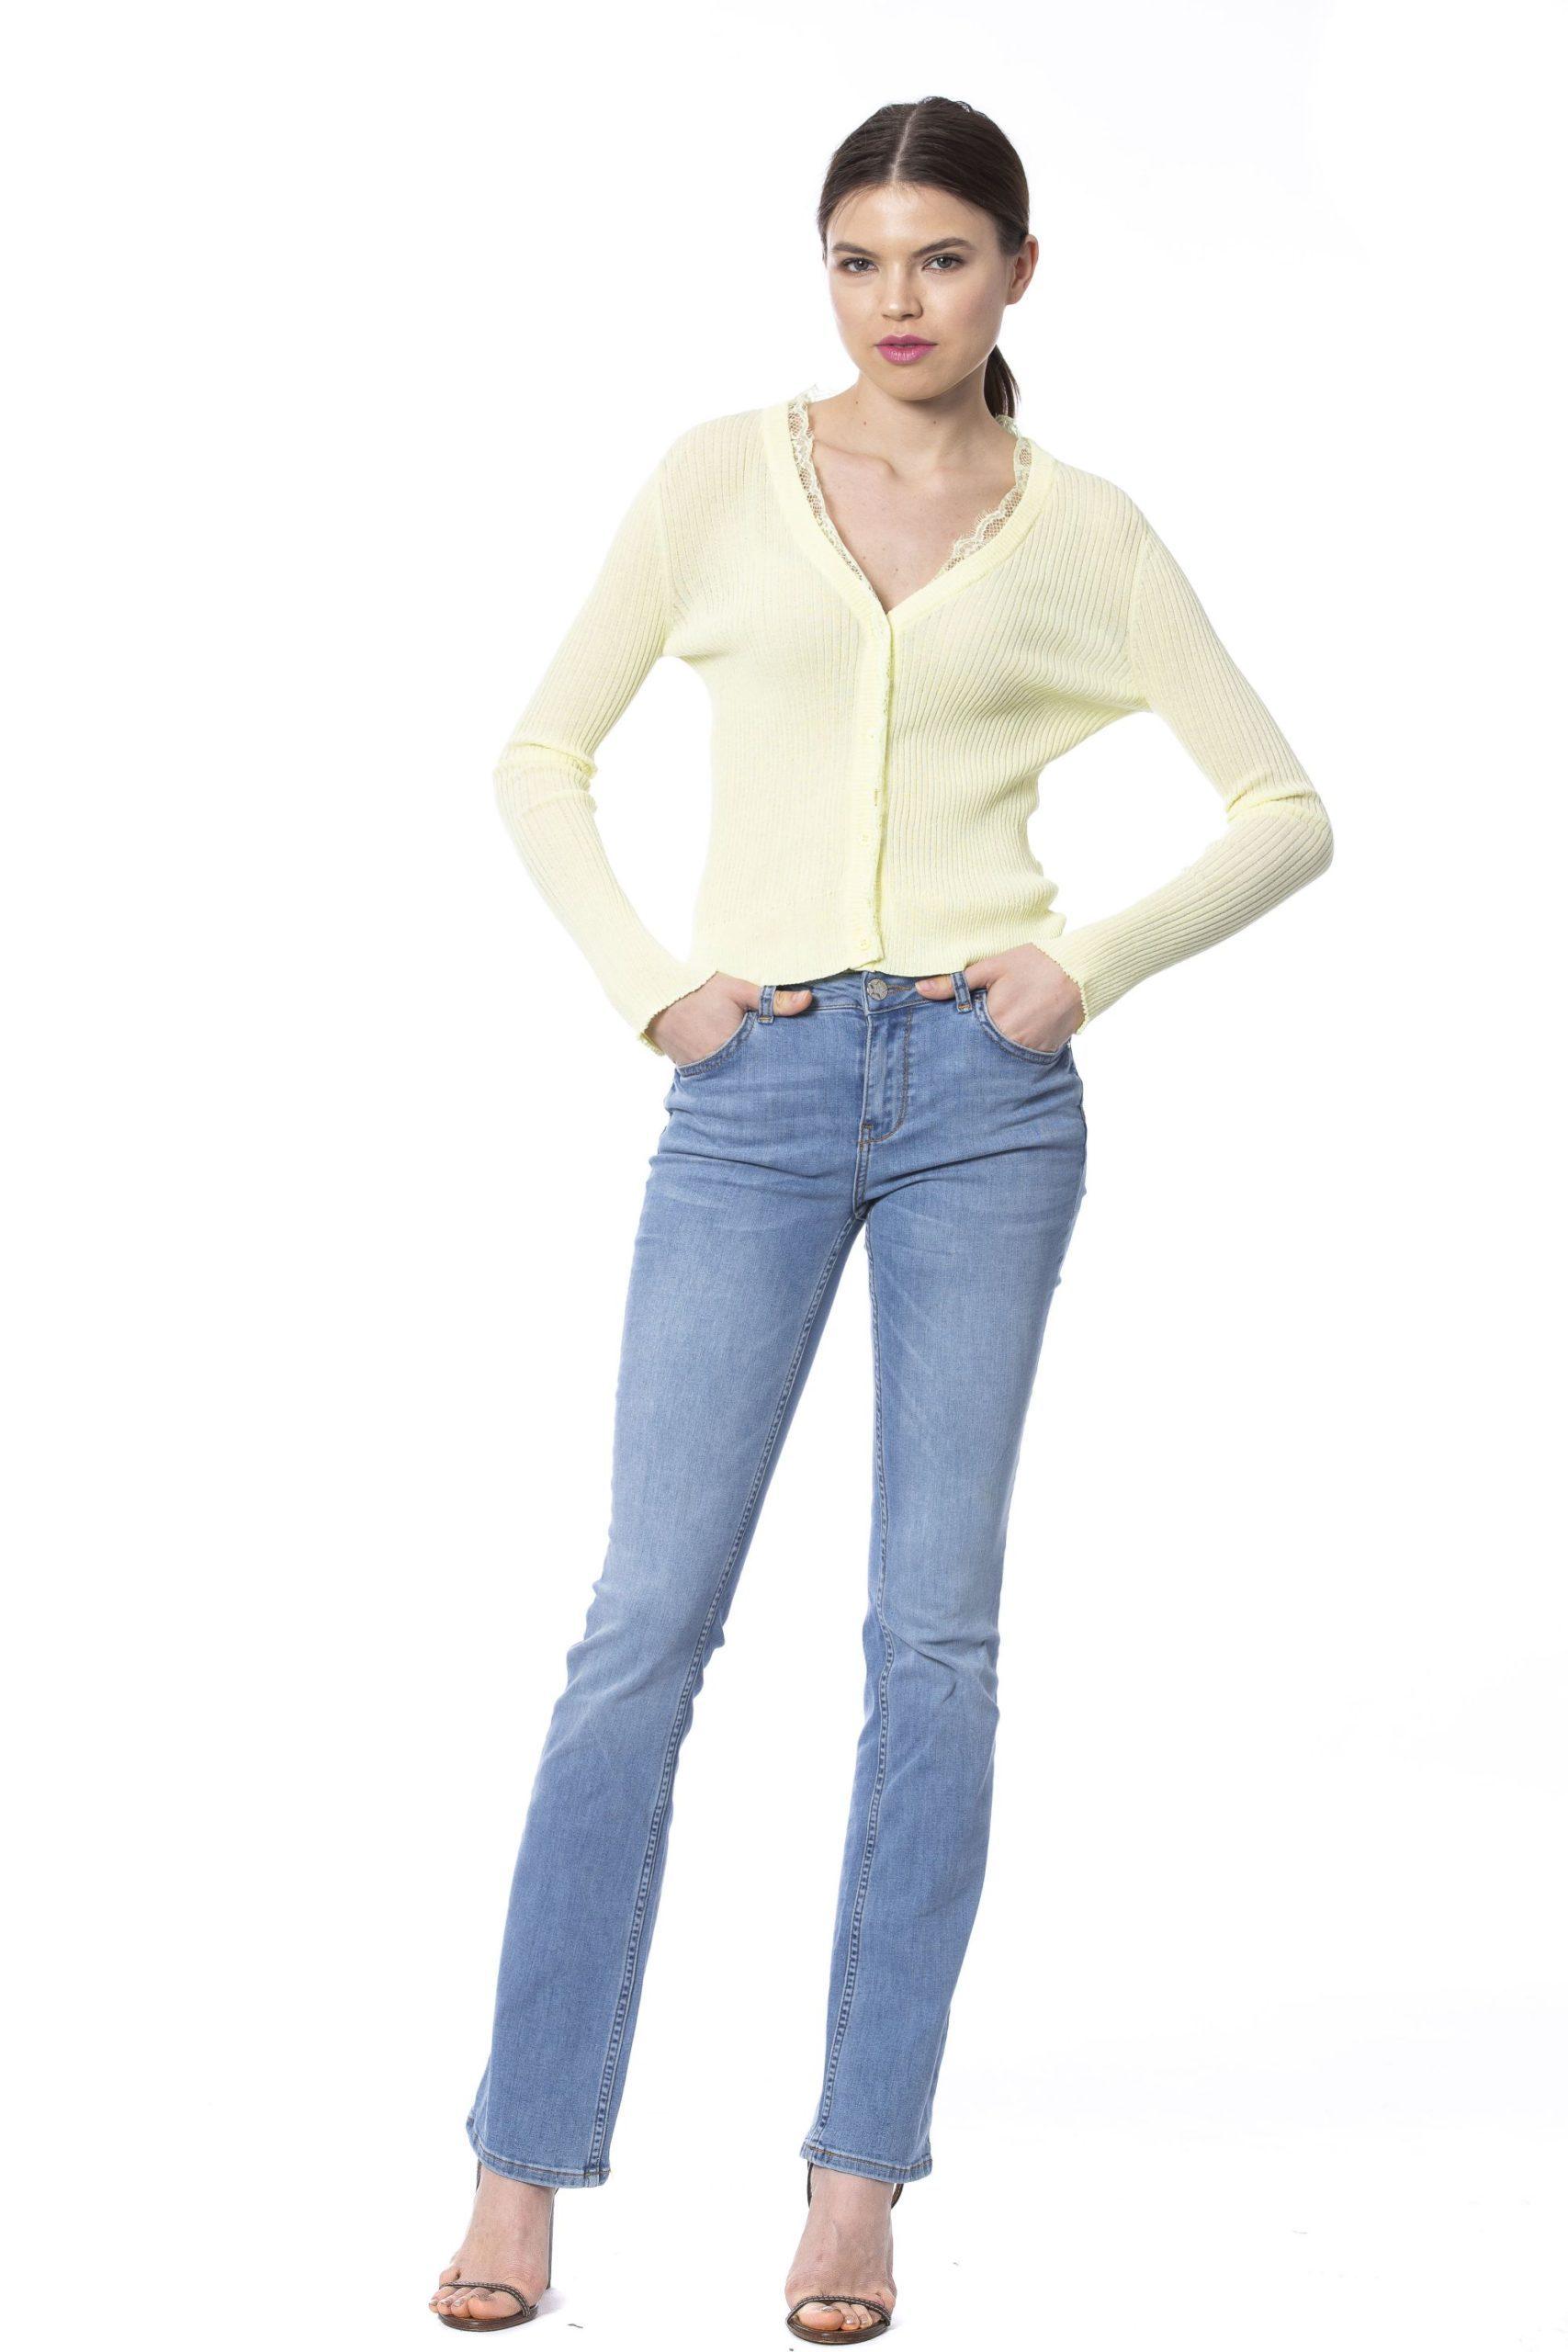 Silvian Heach Women's Sweater Yellow SI1258828 - XS